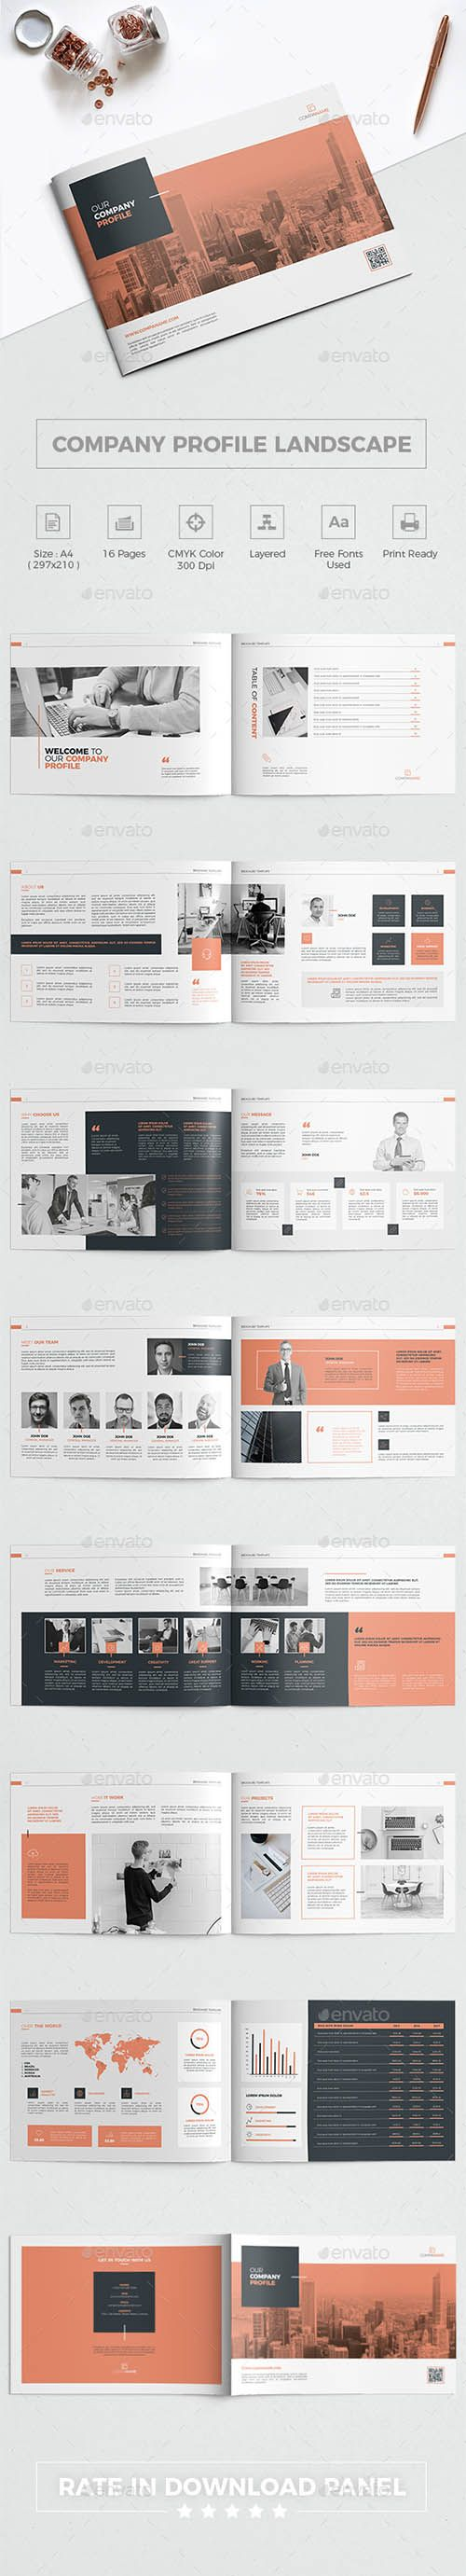 GR Company Profile Landscape Brochure 21556307